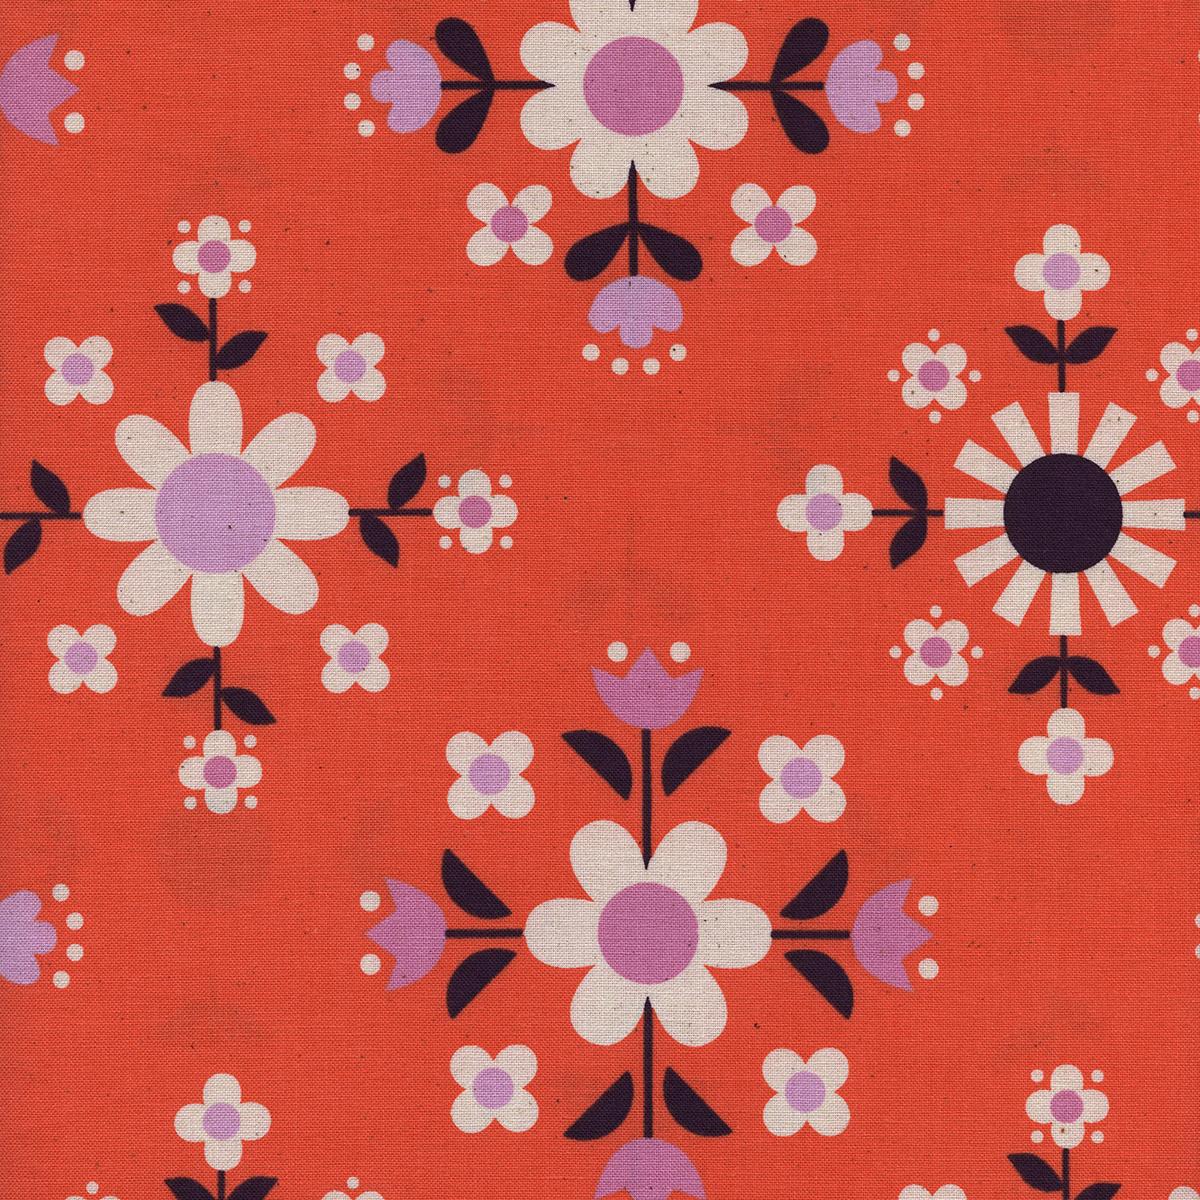 3057-1.Welsummer.Florametry.SweetOrange.UNB